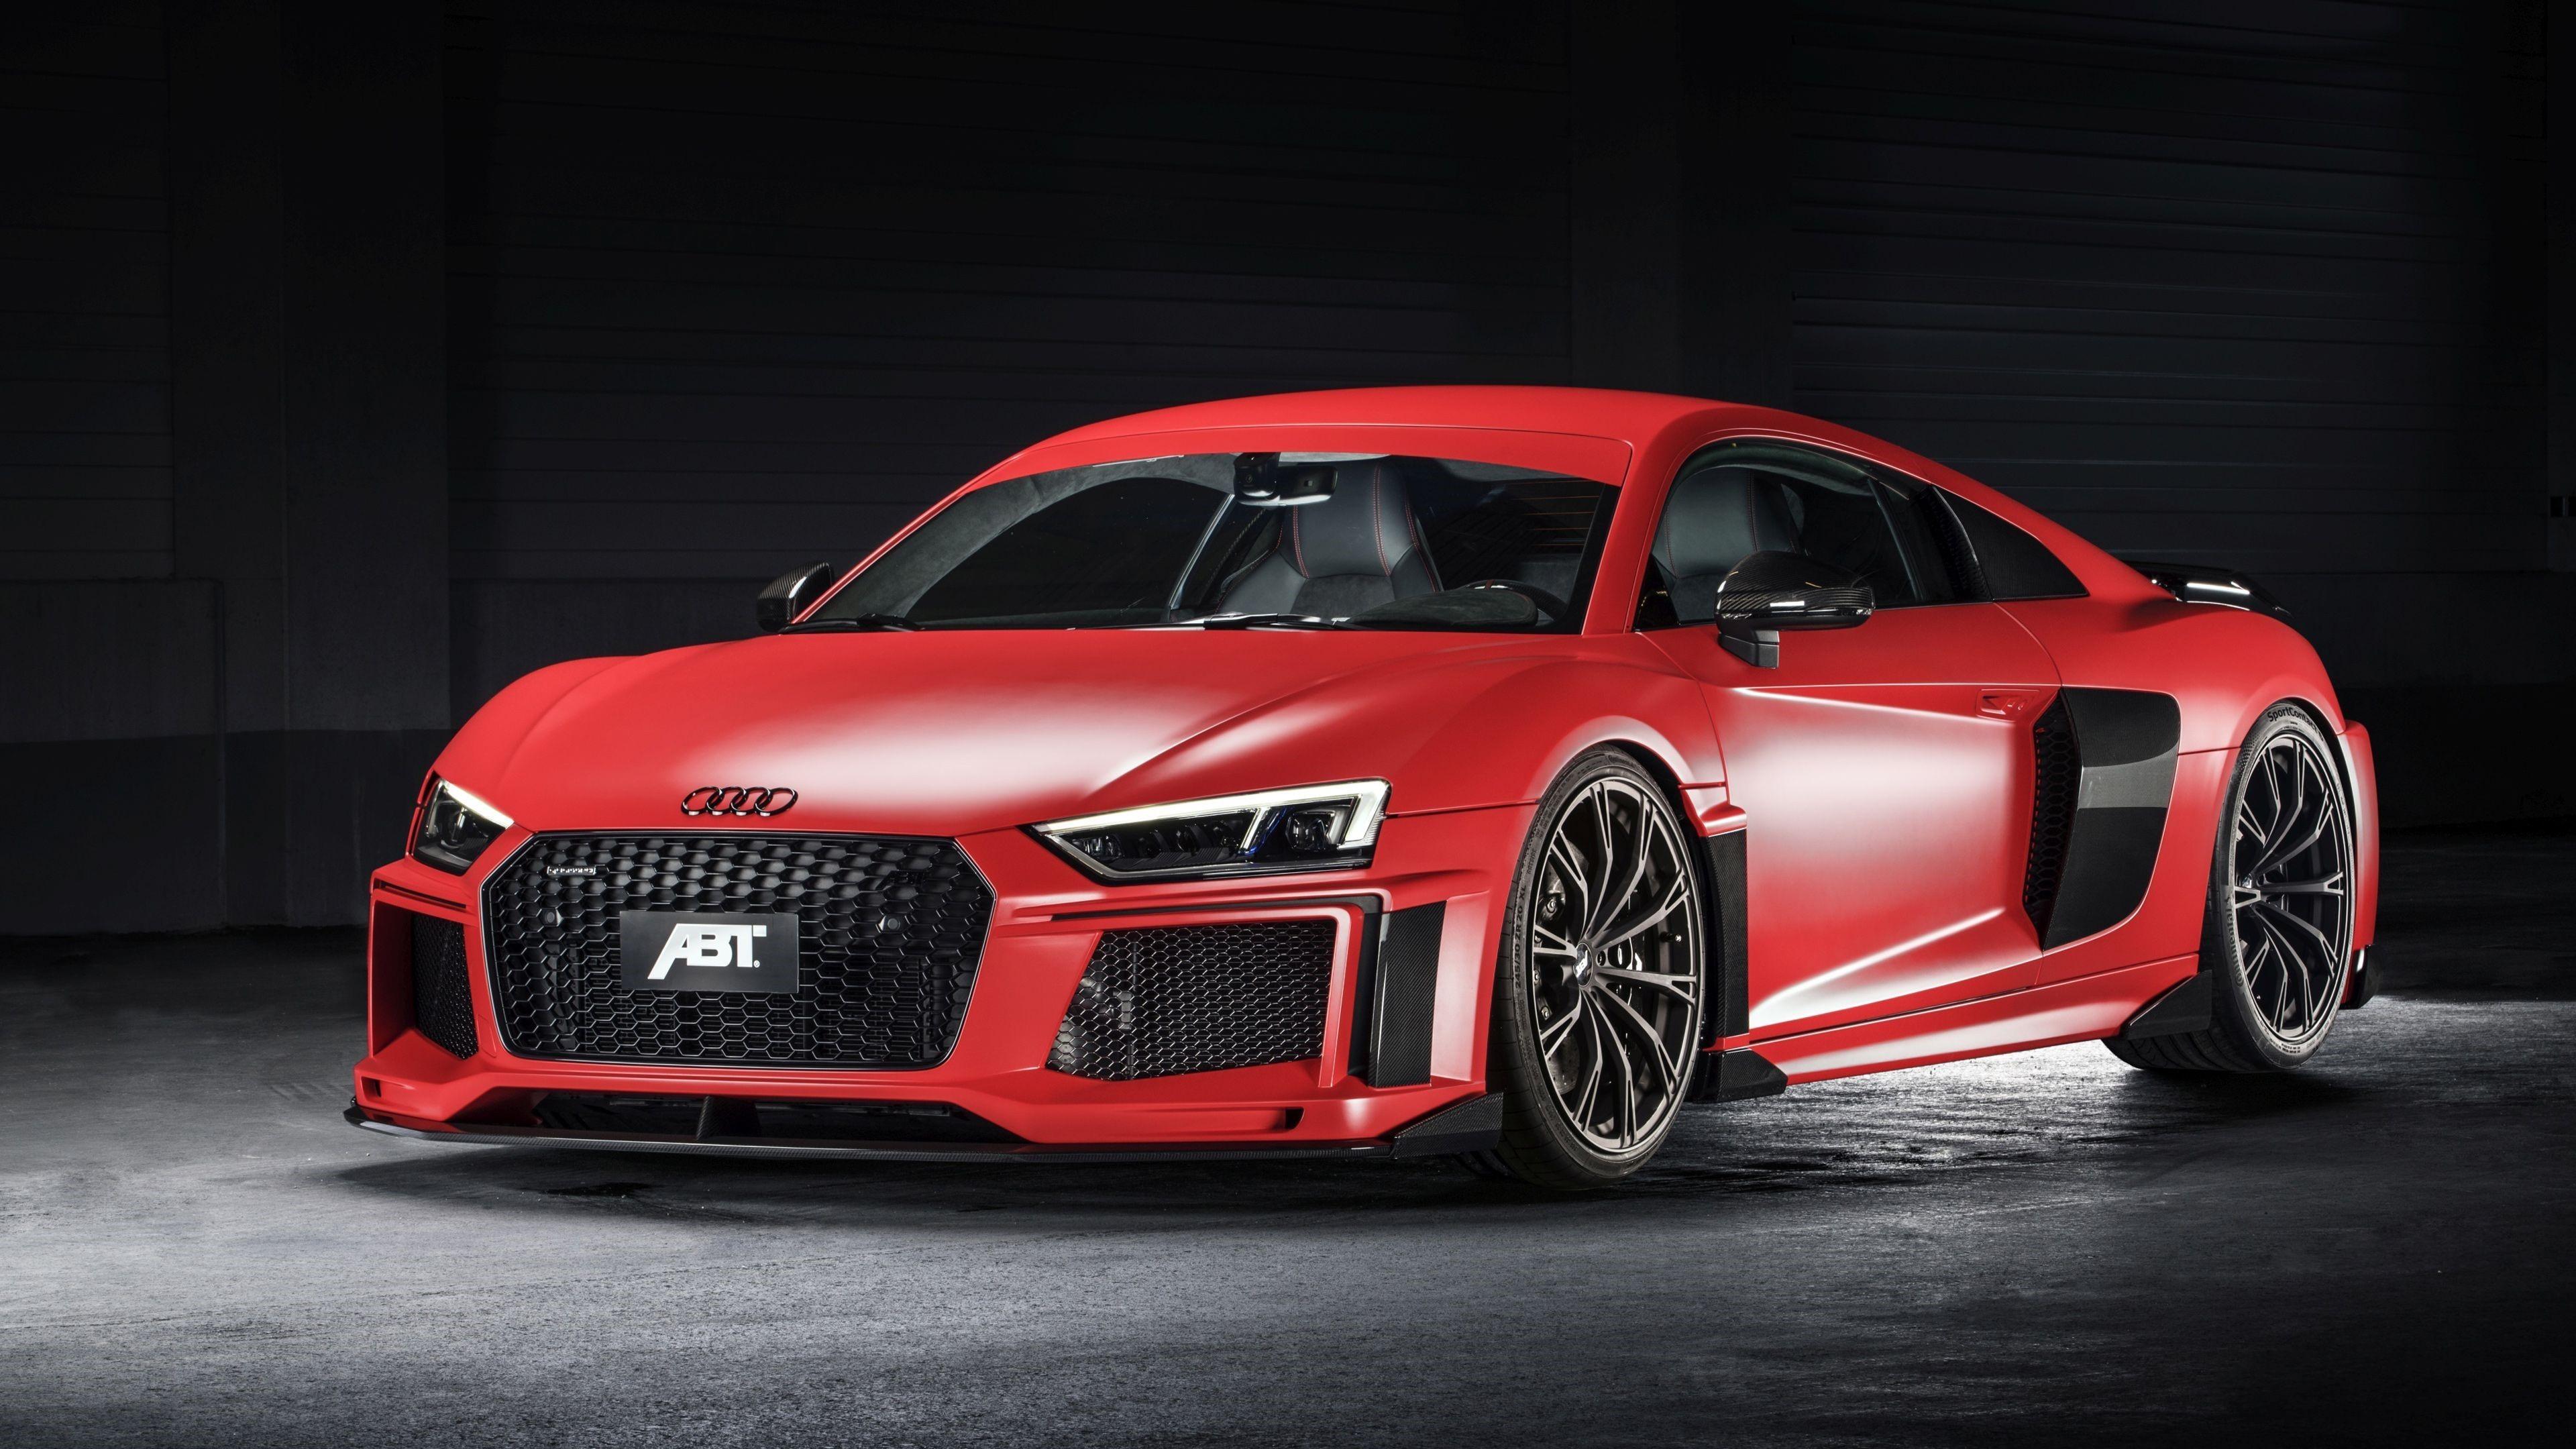 Audi R8 UHD Wallpapers